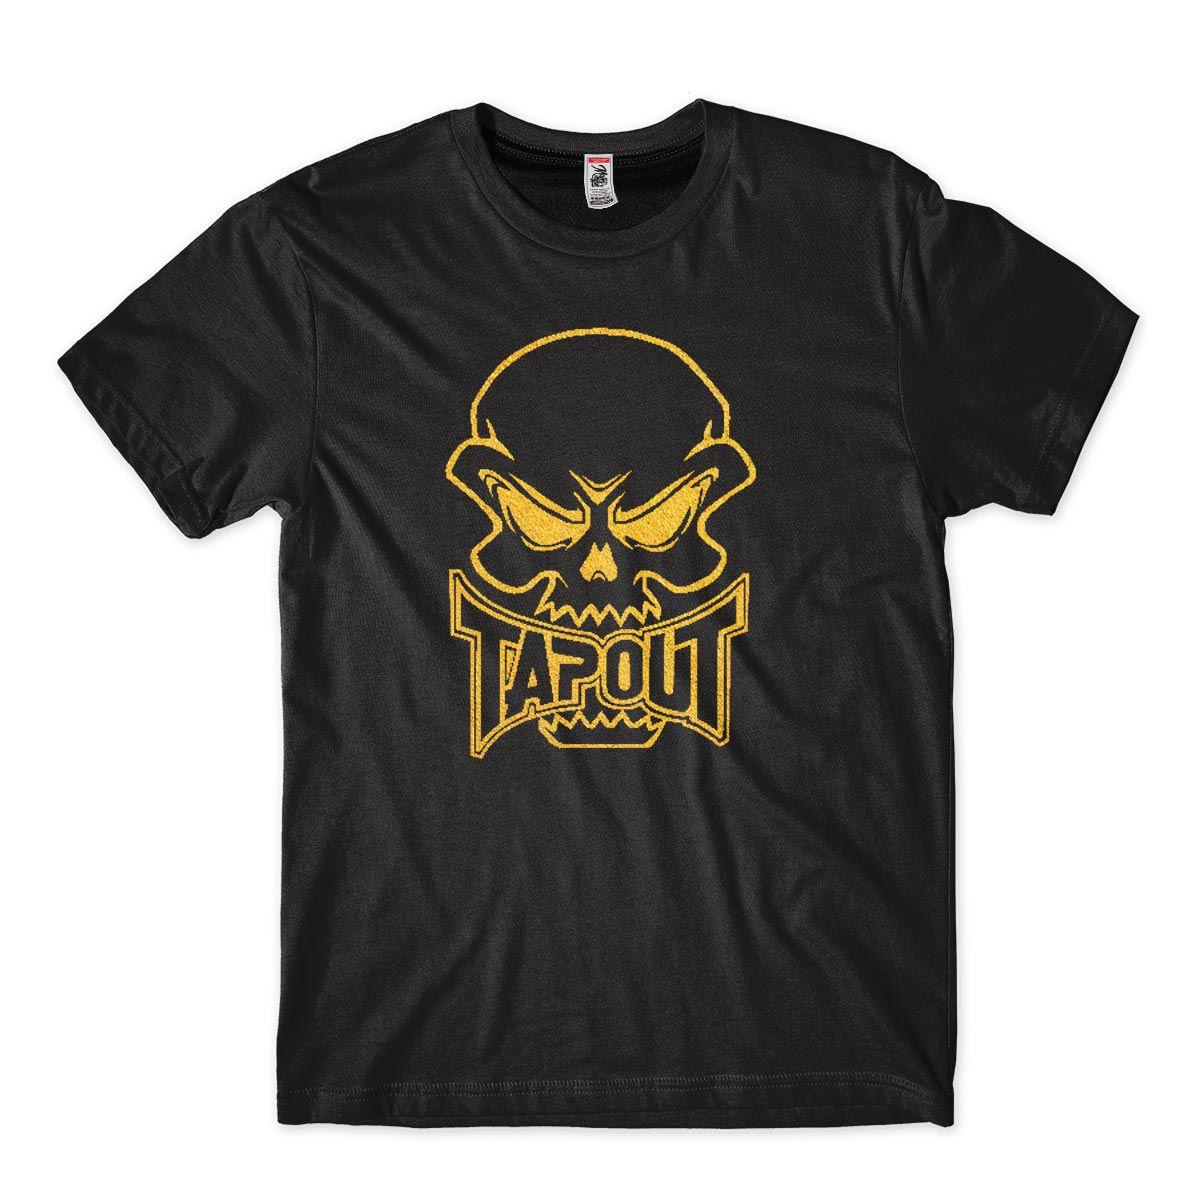 Camiseta Masculina para Academia Inspiracao TapOut Preta